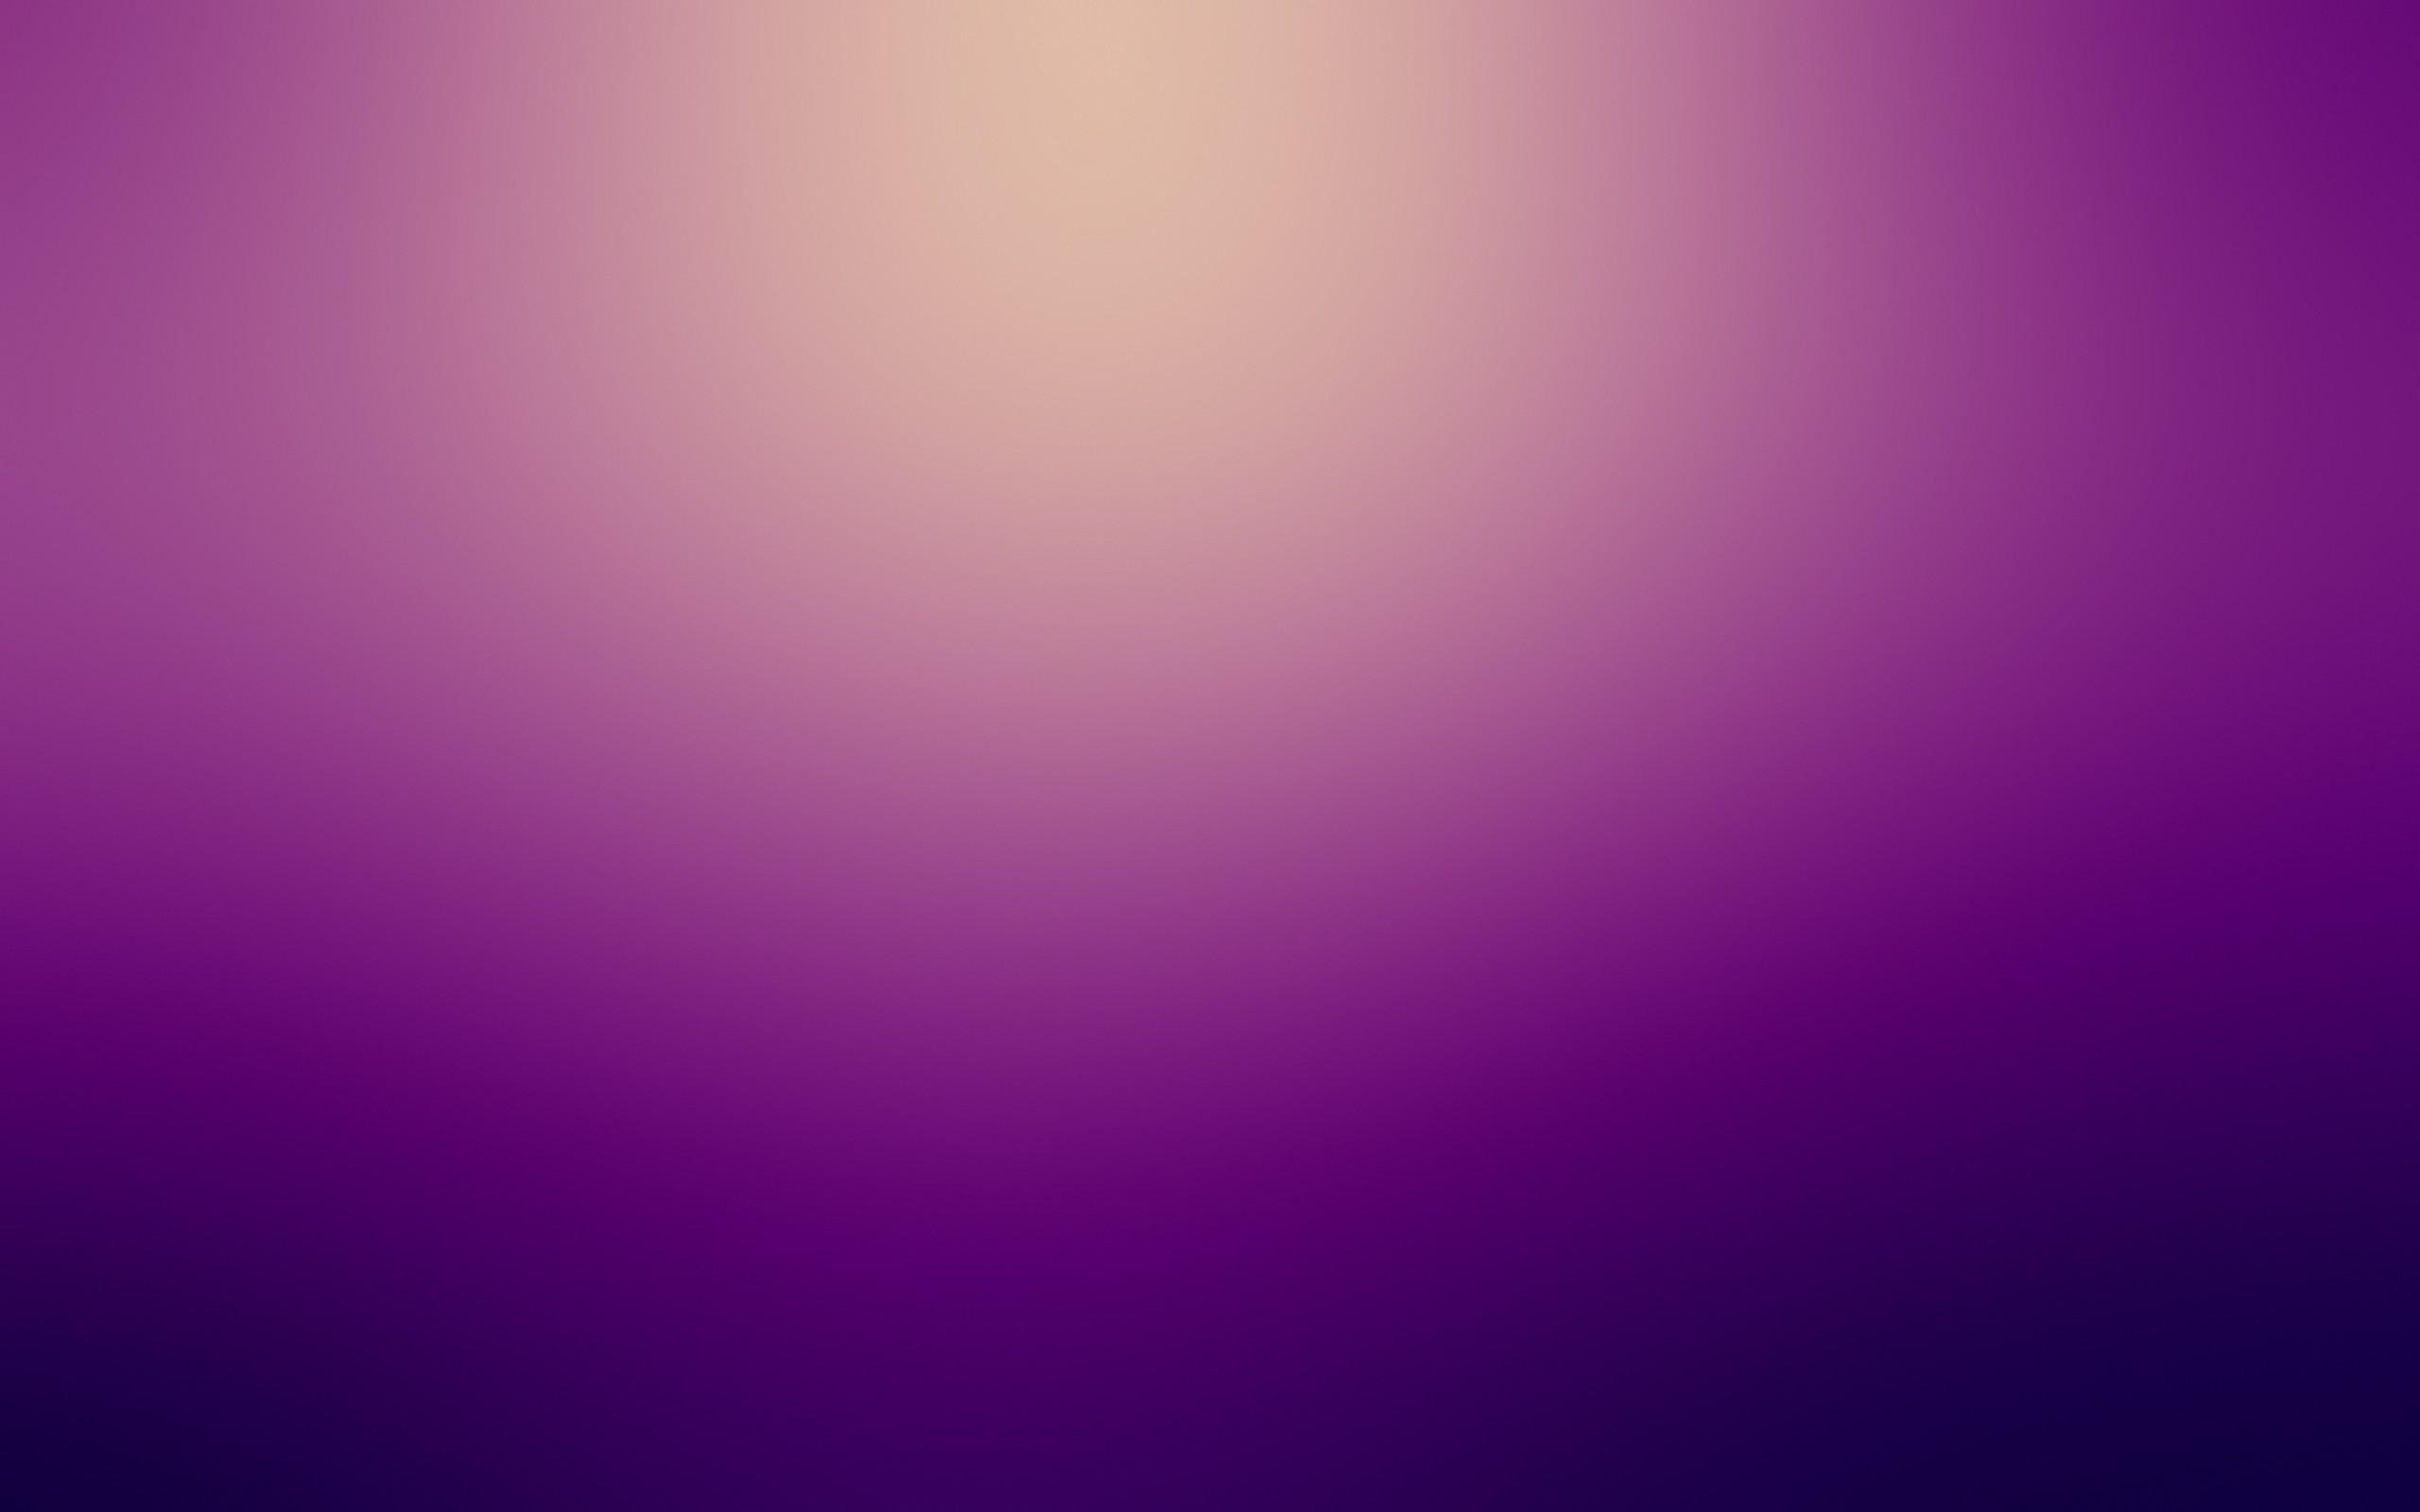 bright-purple-backgrounds